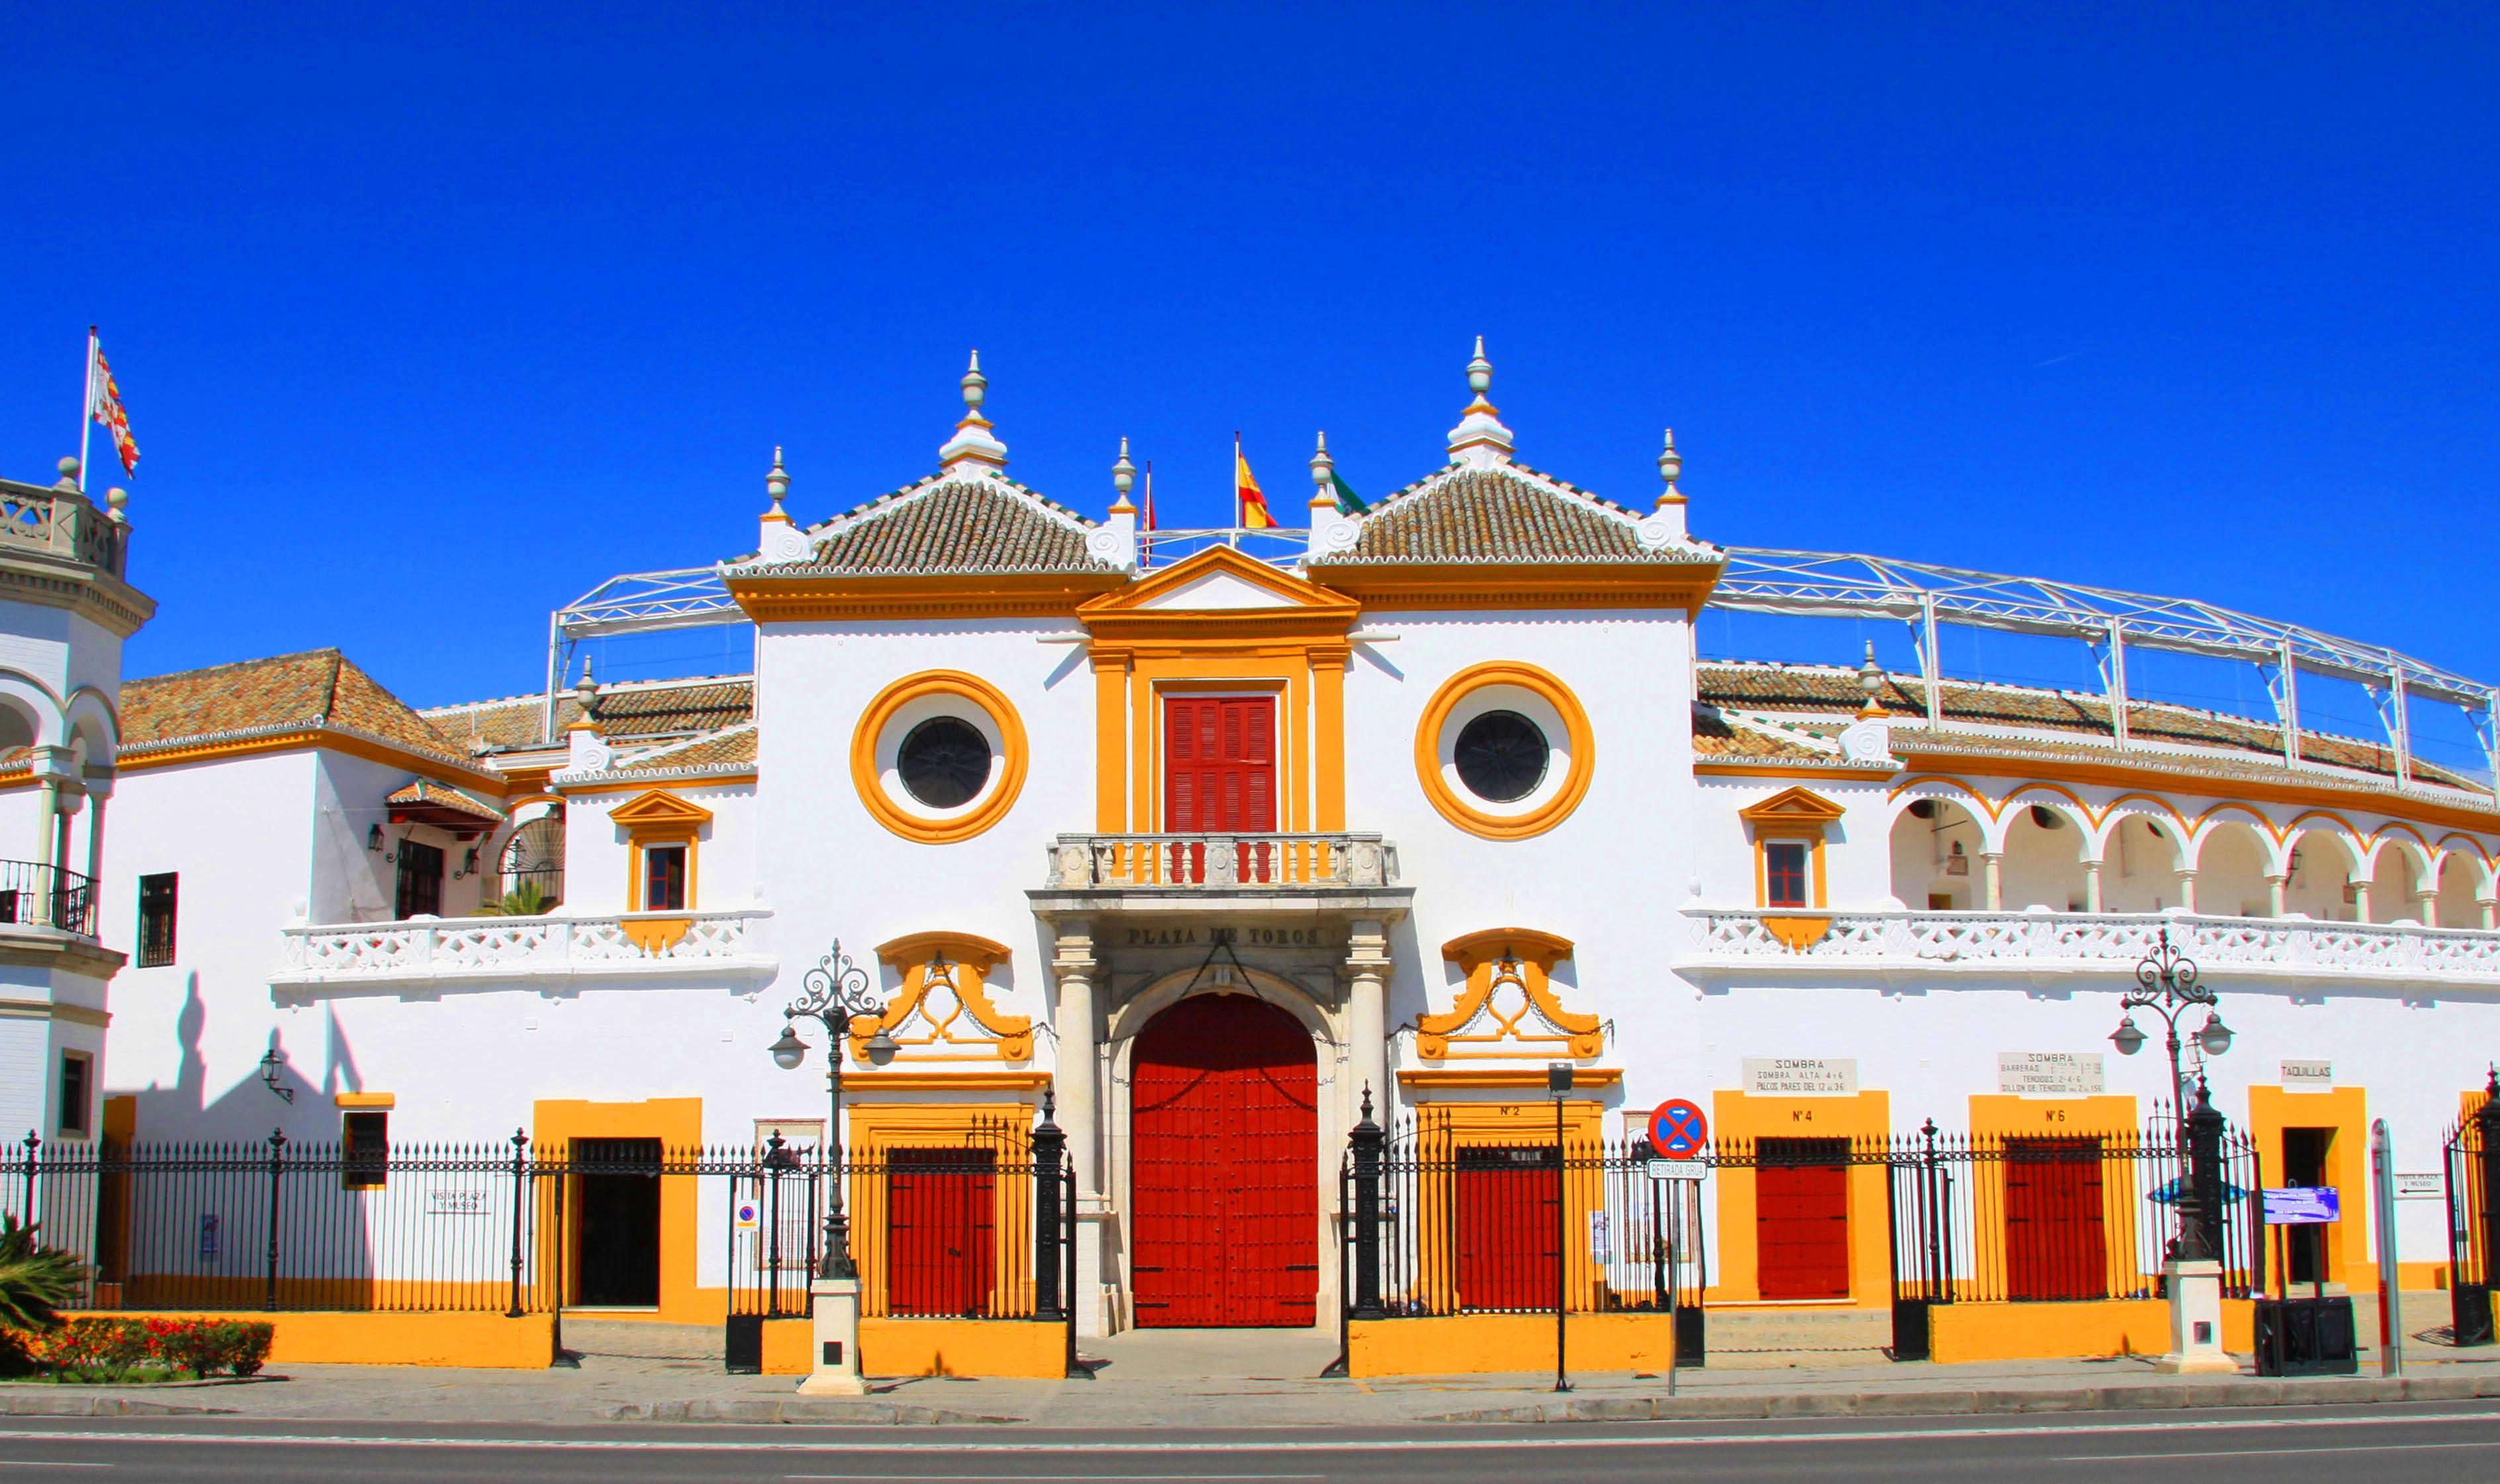 Plaza_de_Toros_de_la_Maestranza edited